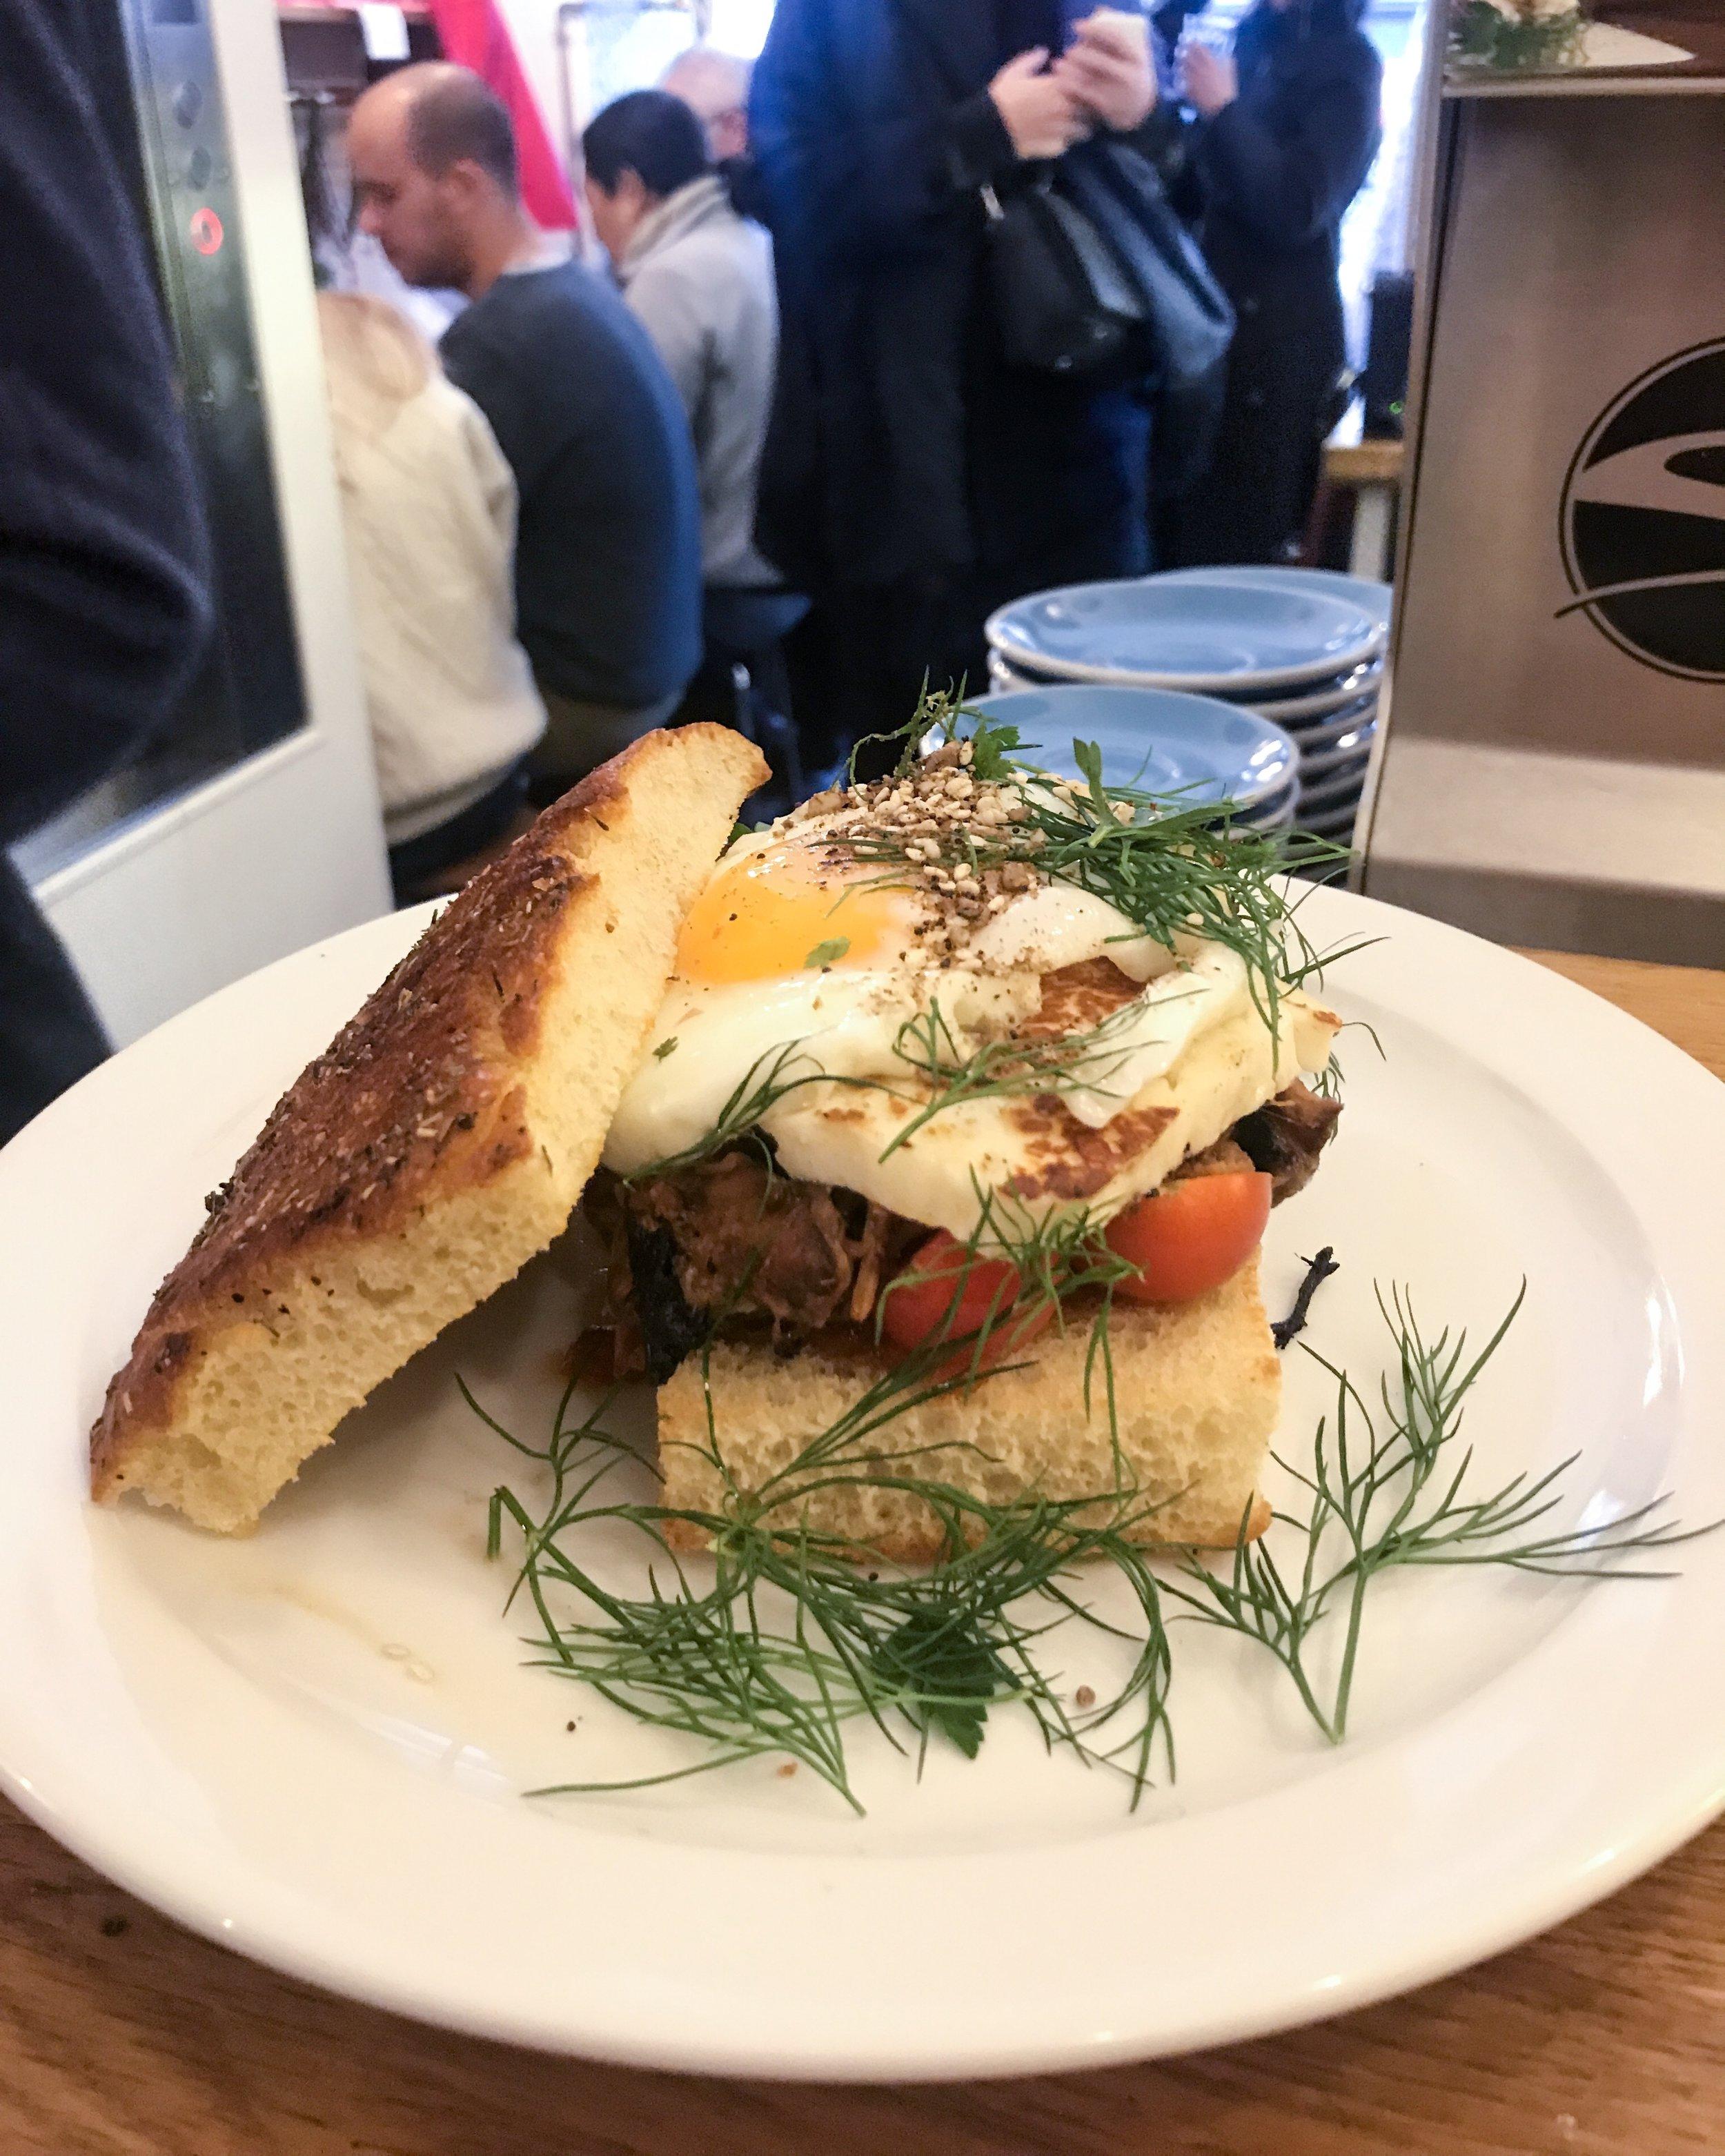 neighbours-coffee-shop-paris-gastronomie-espresso-cafe-de-specialite-specialty-france-barista-guide-baristas-et-associes-sandwich.jpg